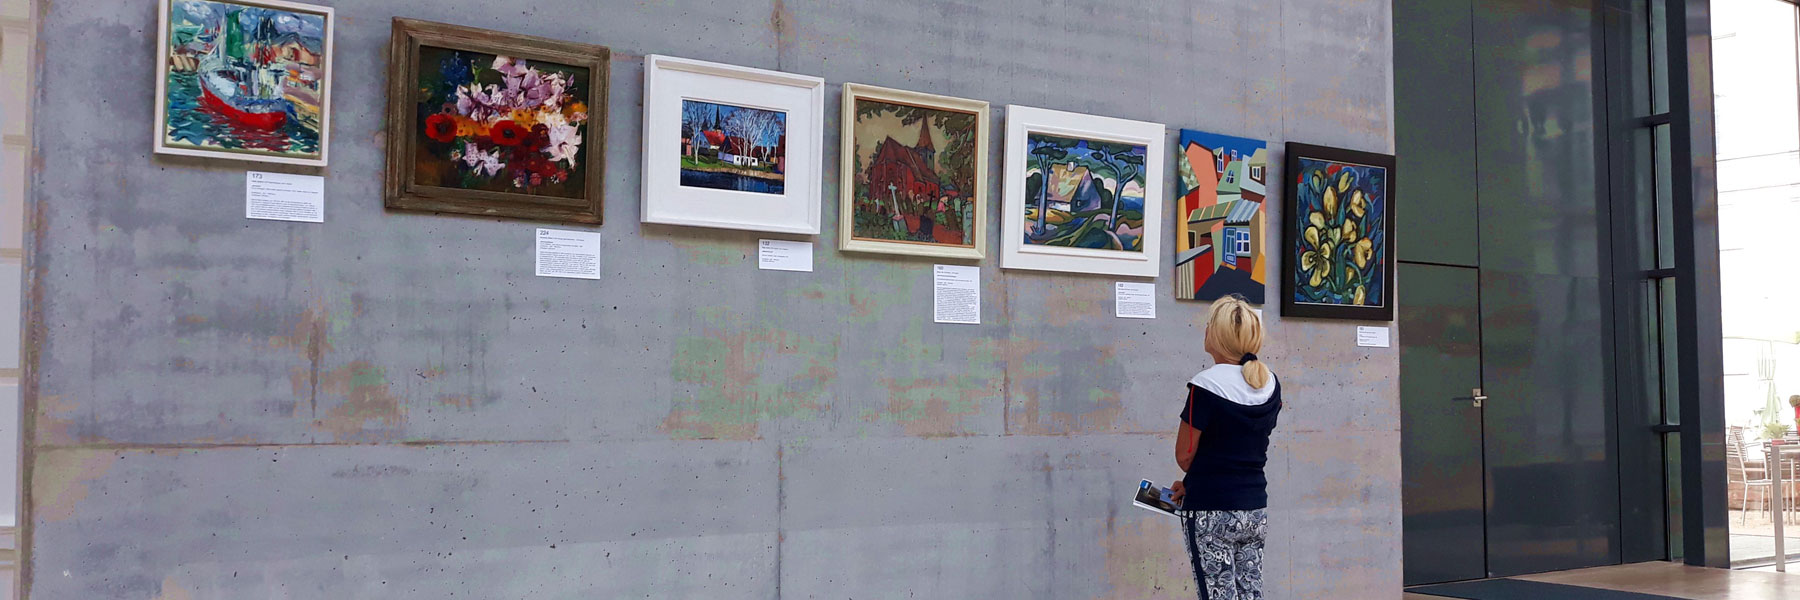 Ausstellung - Koserower Kunstsalon